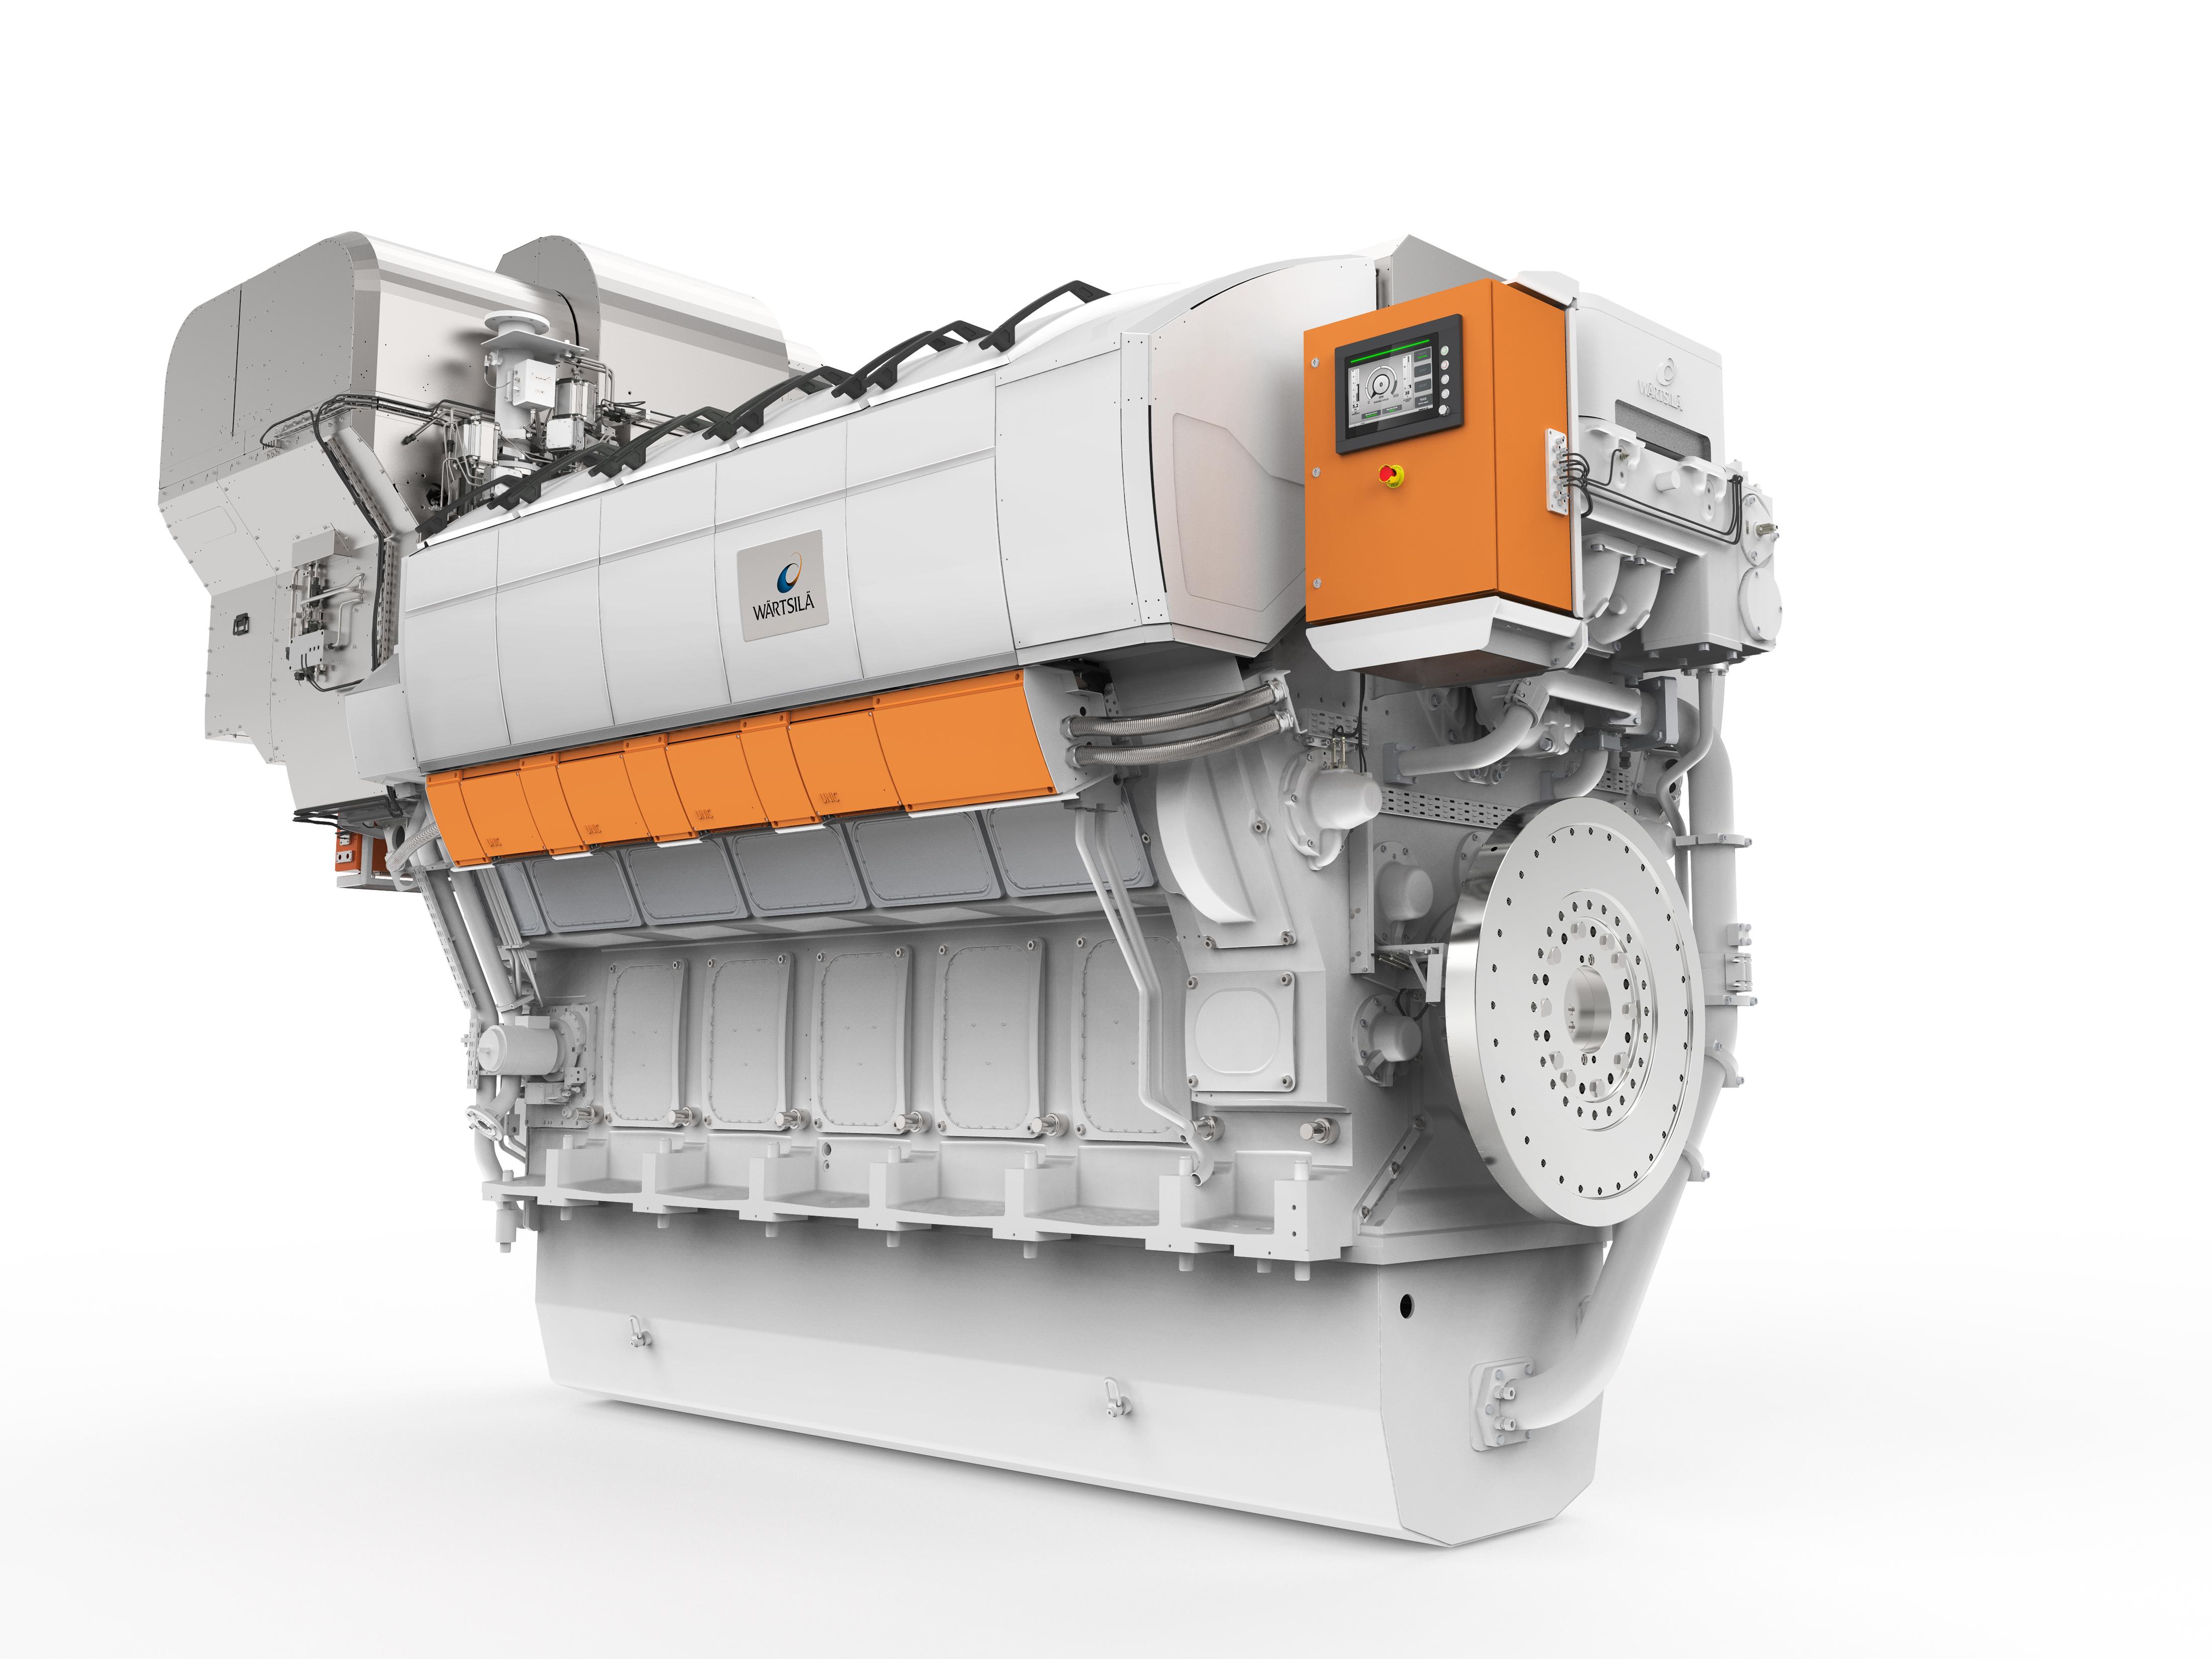 Двигатель семейства <i>Wärtsilä 31</i>.